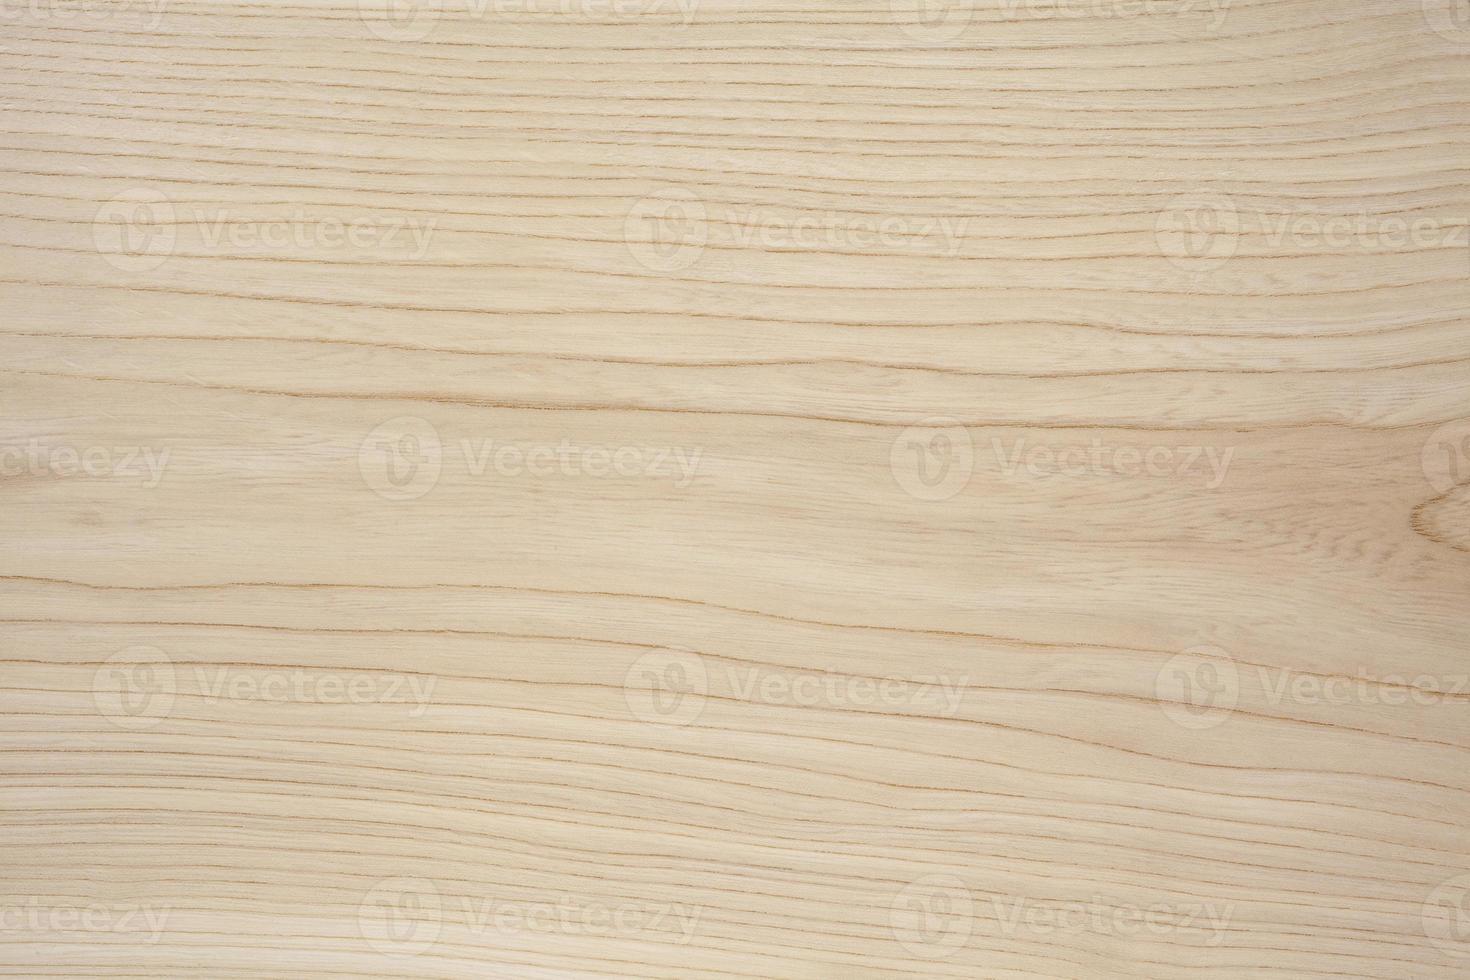 fondo de textura de tablero de madera foto